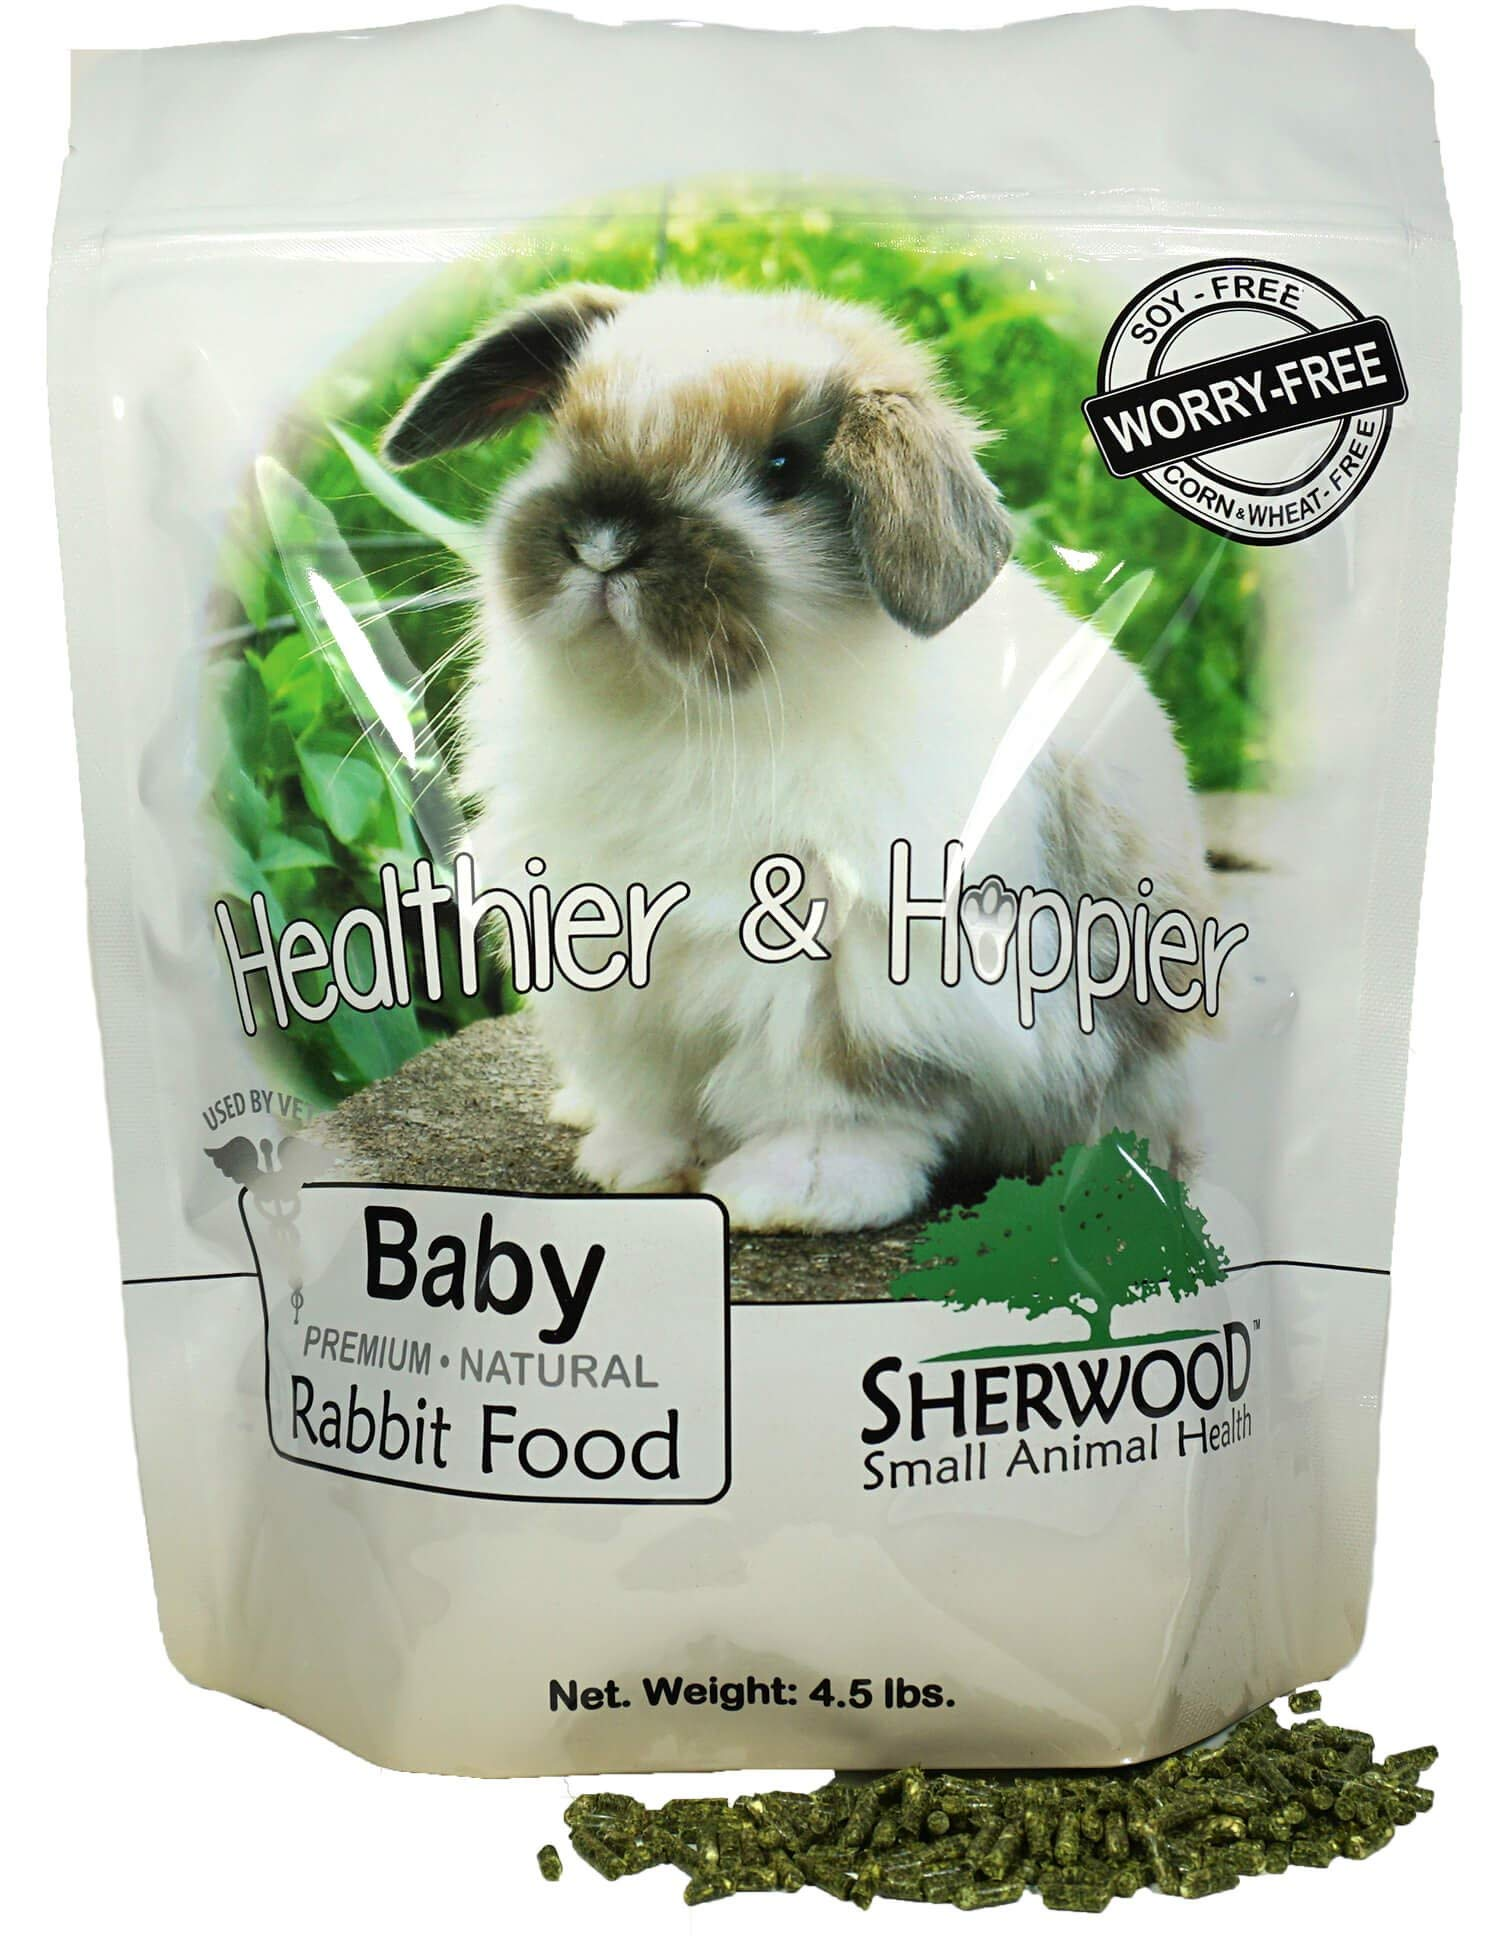 Sherwood Pet Health Rabbit Food, Baby, 4.5 lb. - (Soy, Corn & Wheat-Free) - (Vets Use)